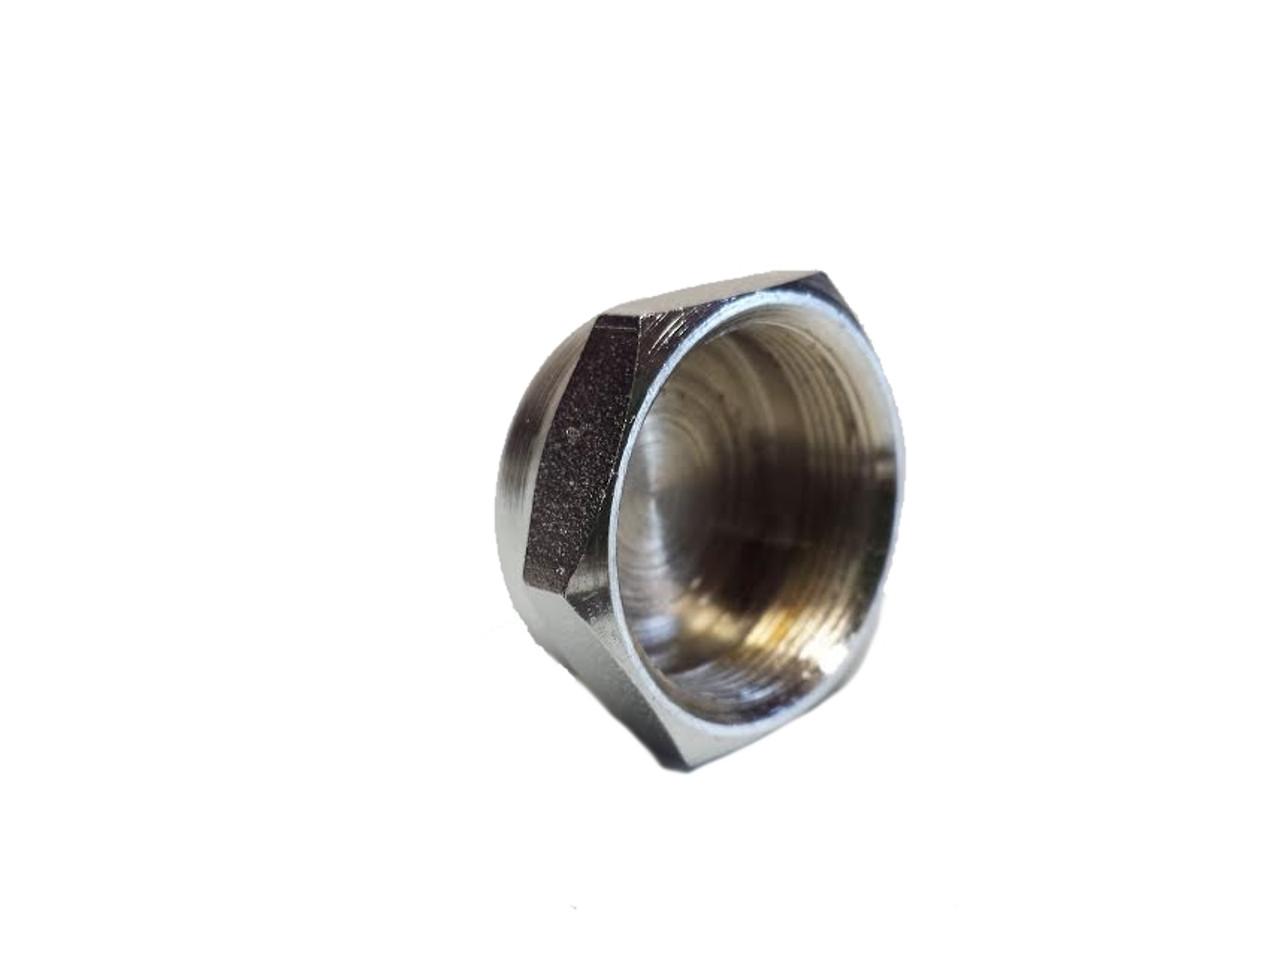 Tomos Crown Nut - Fork Head Tube Nut